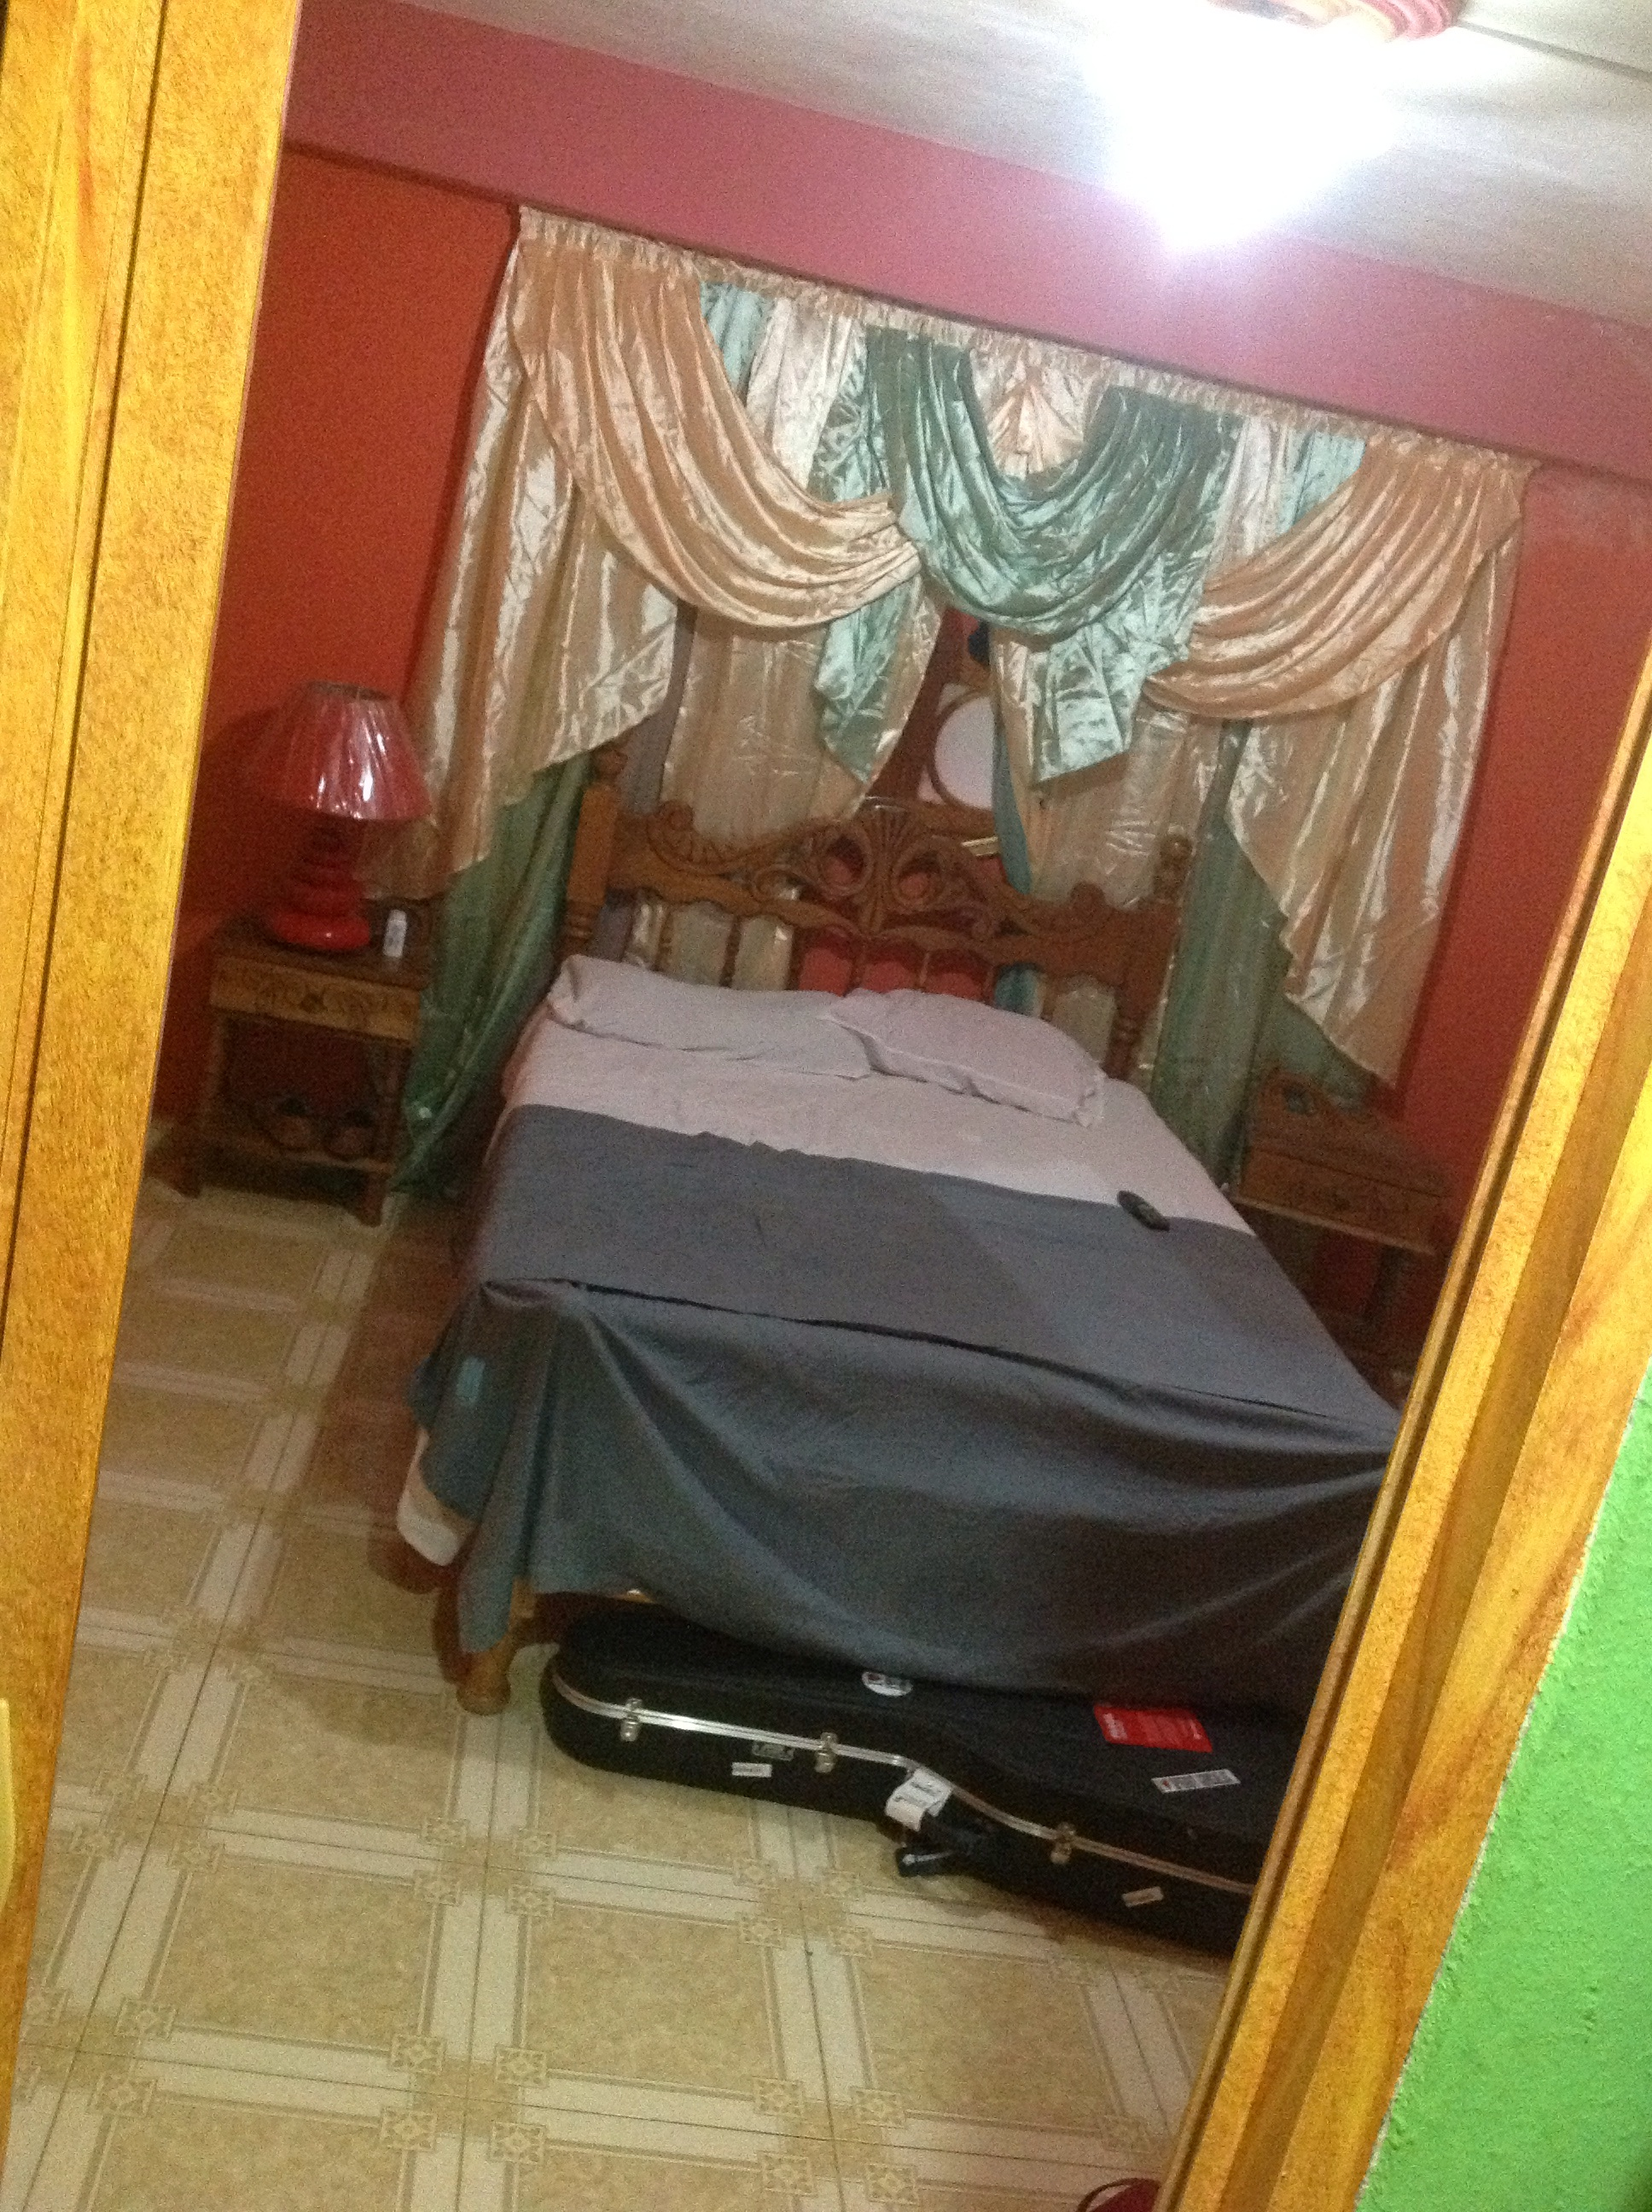 My bedroom where I found it hard to sleep that night